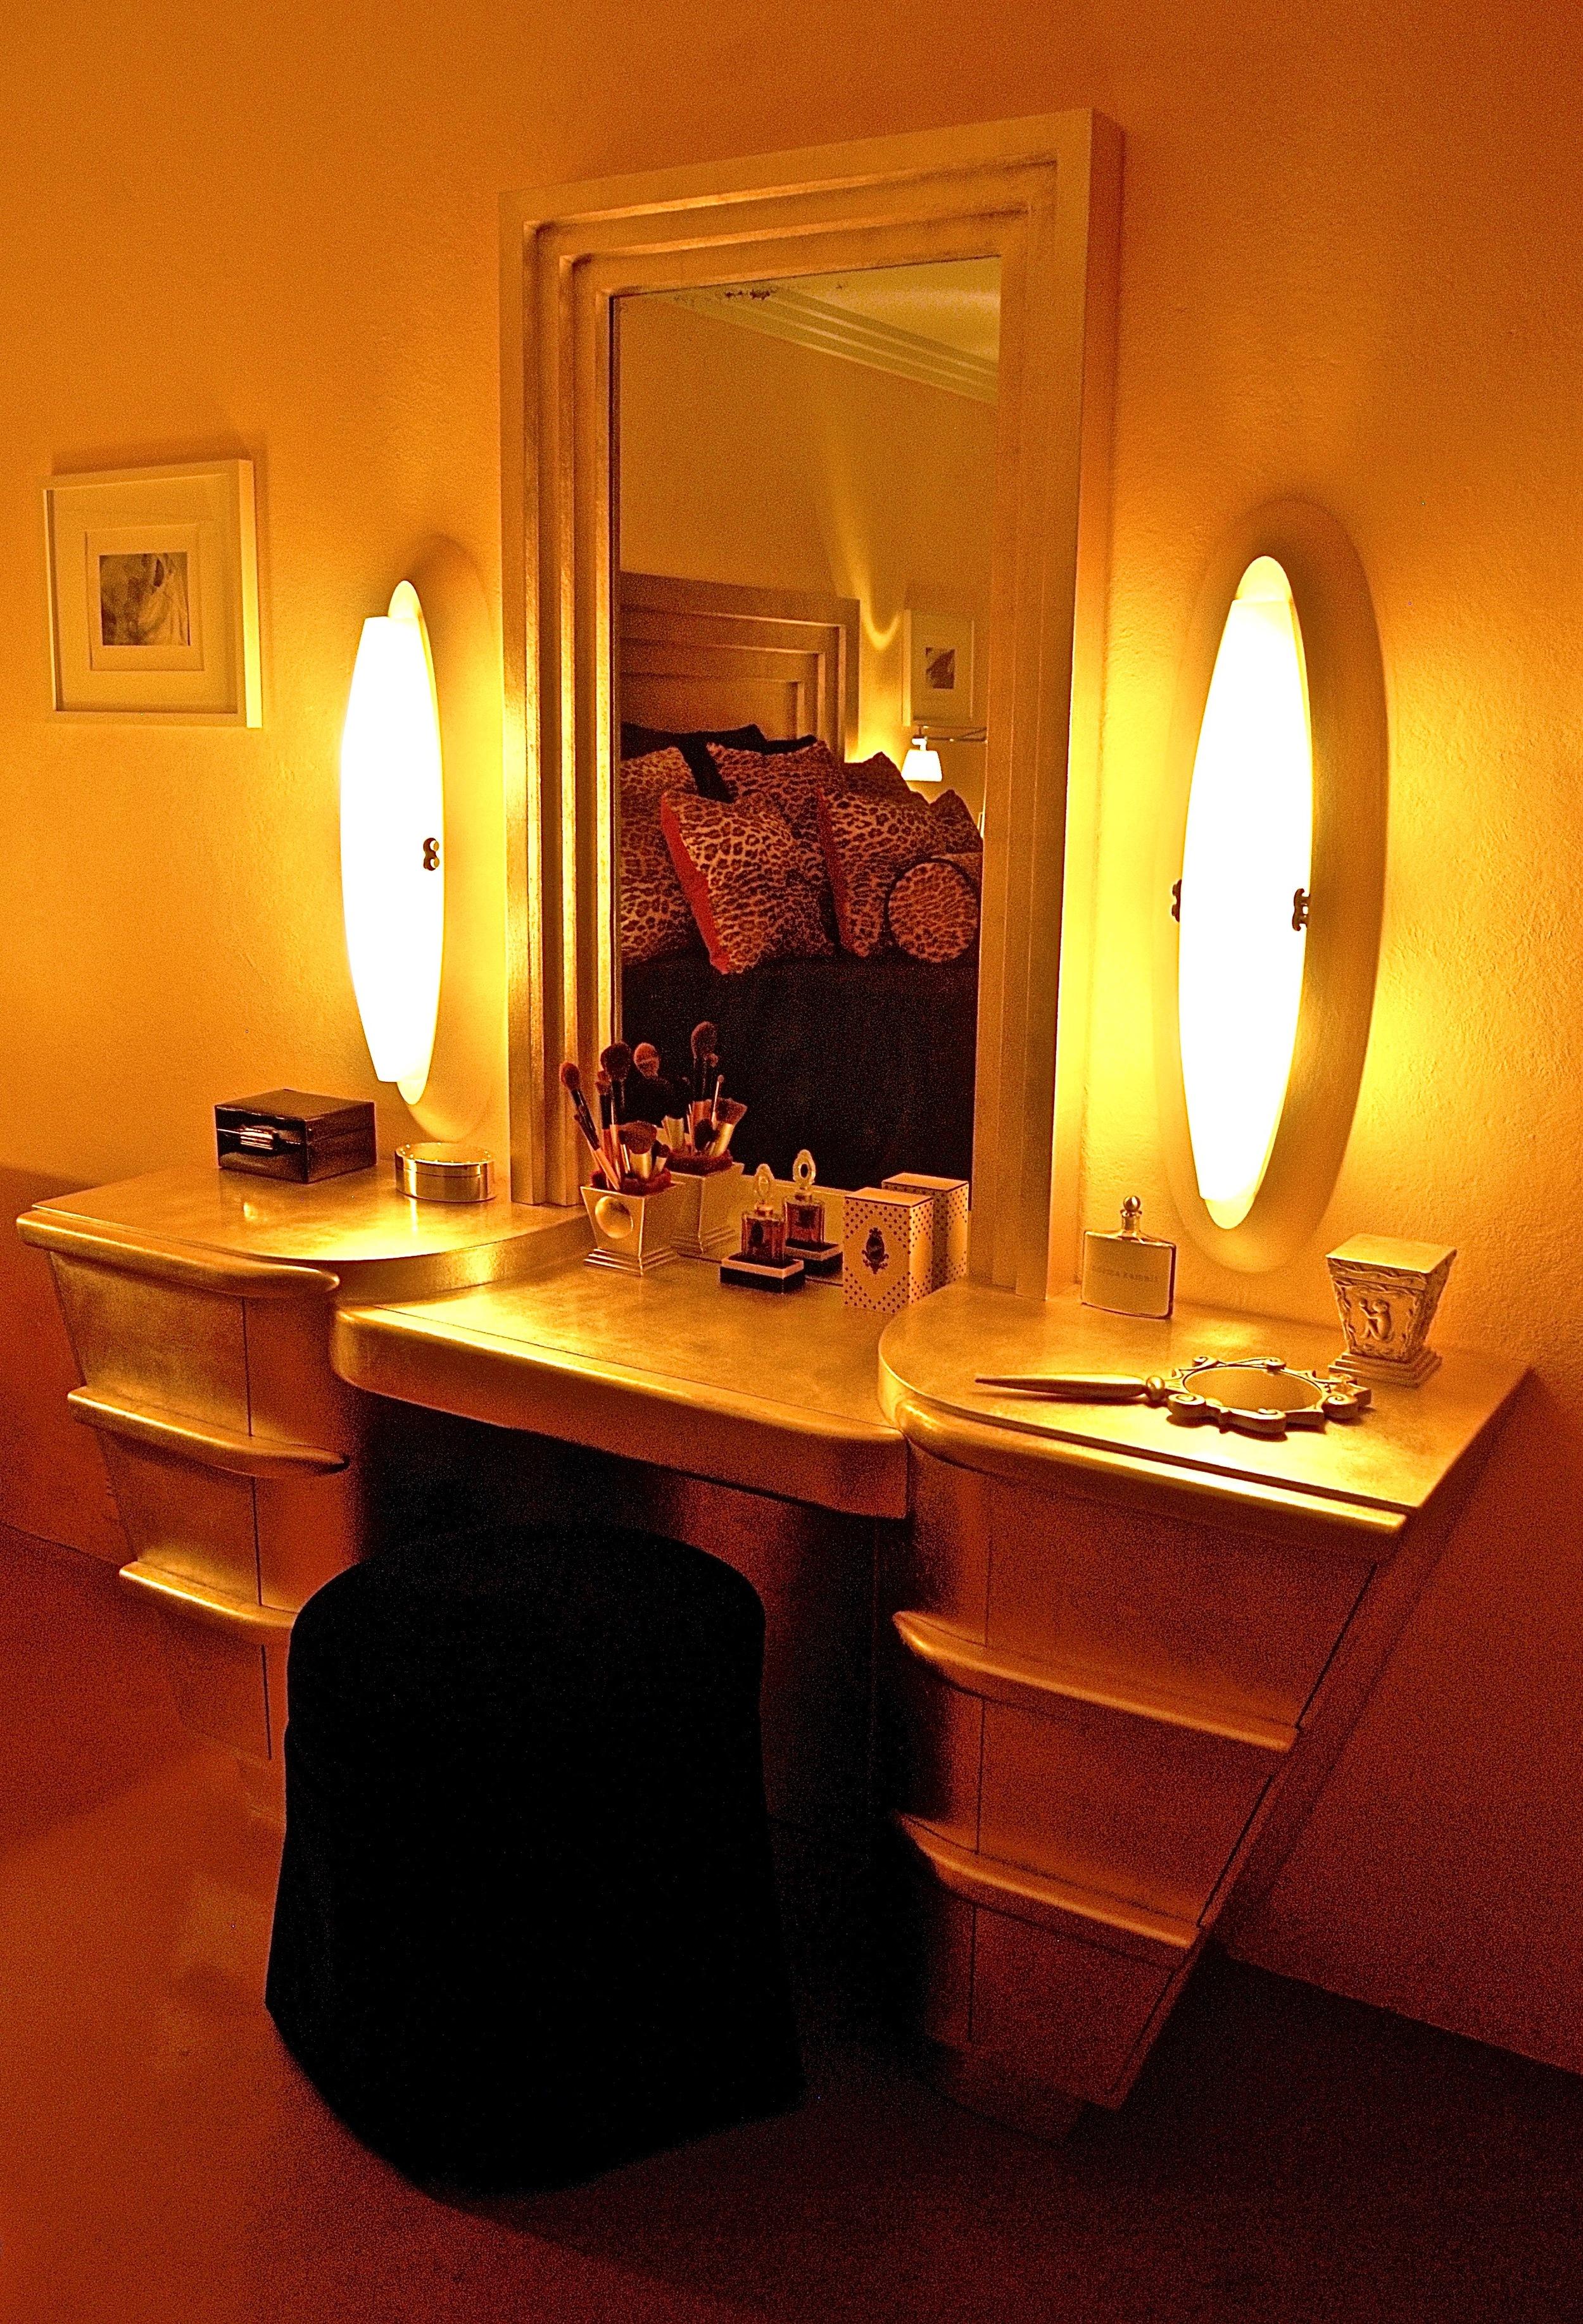 Coffin & King Custom Furniture/ Interiors - Dream Vanity, 14 Kt. White Gold Leaf